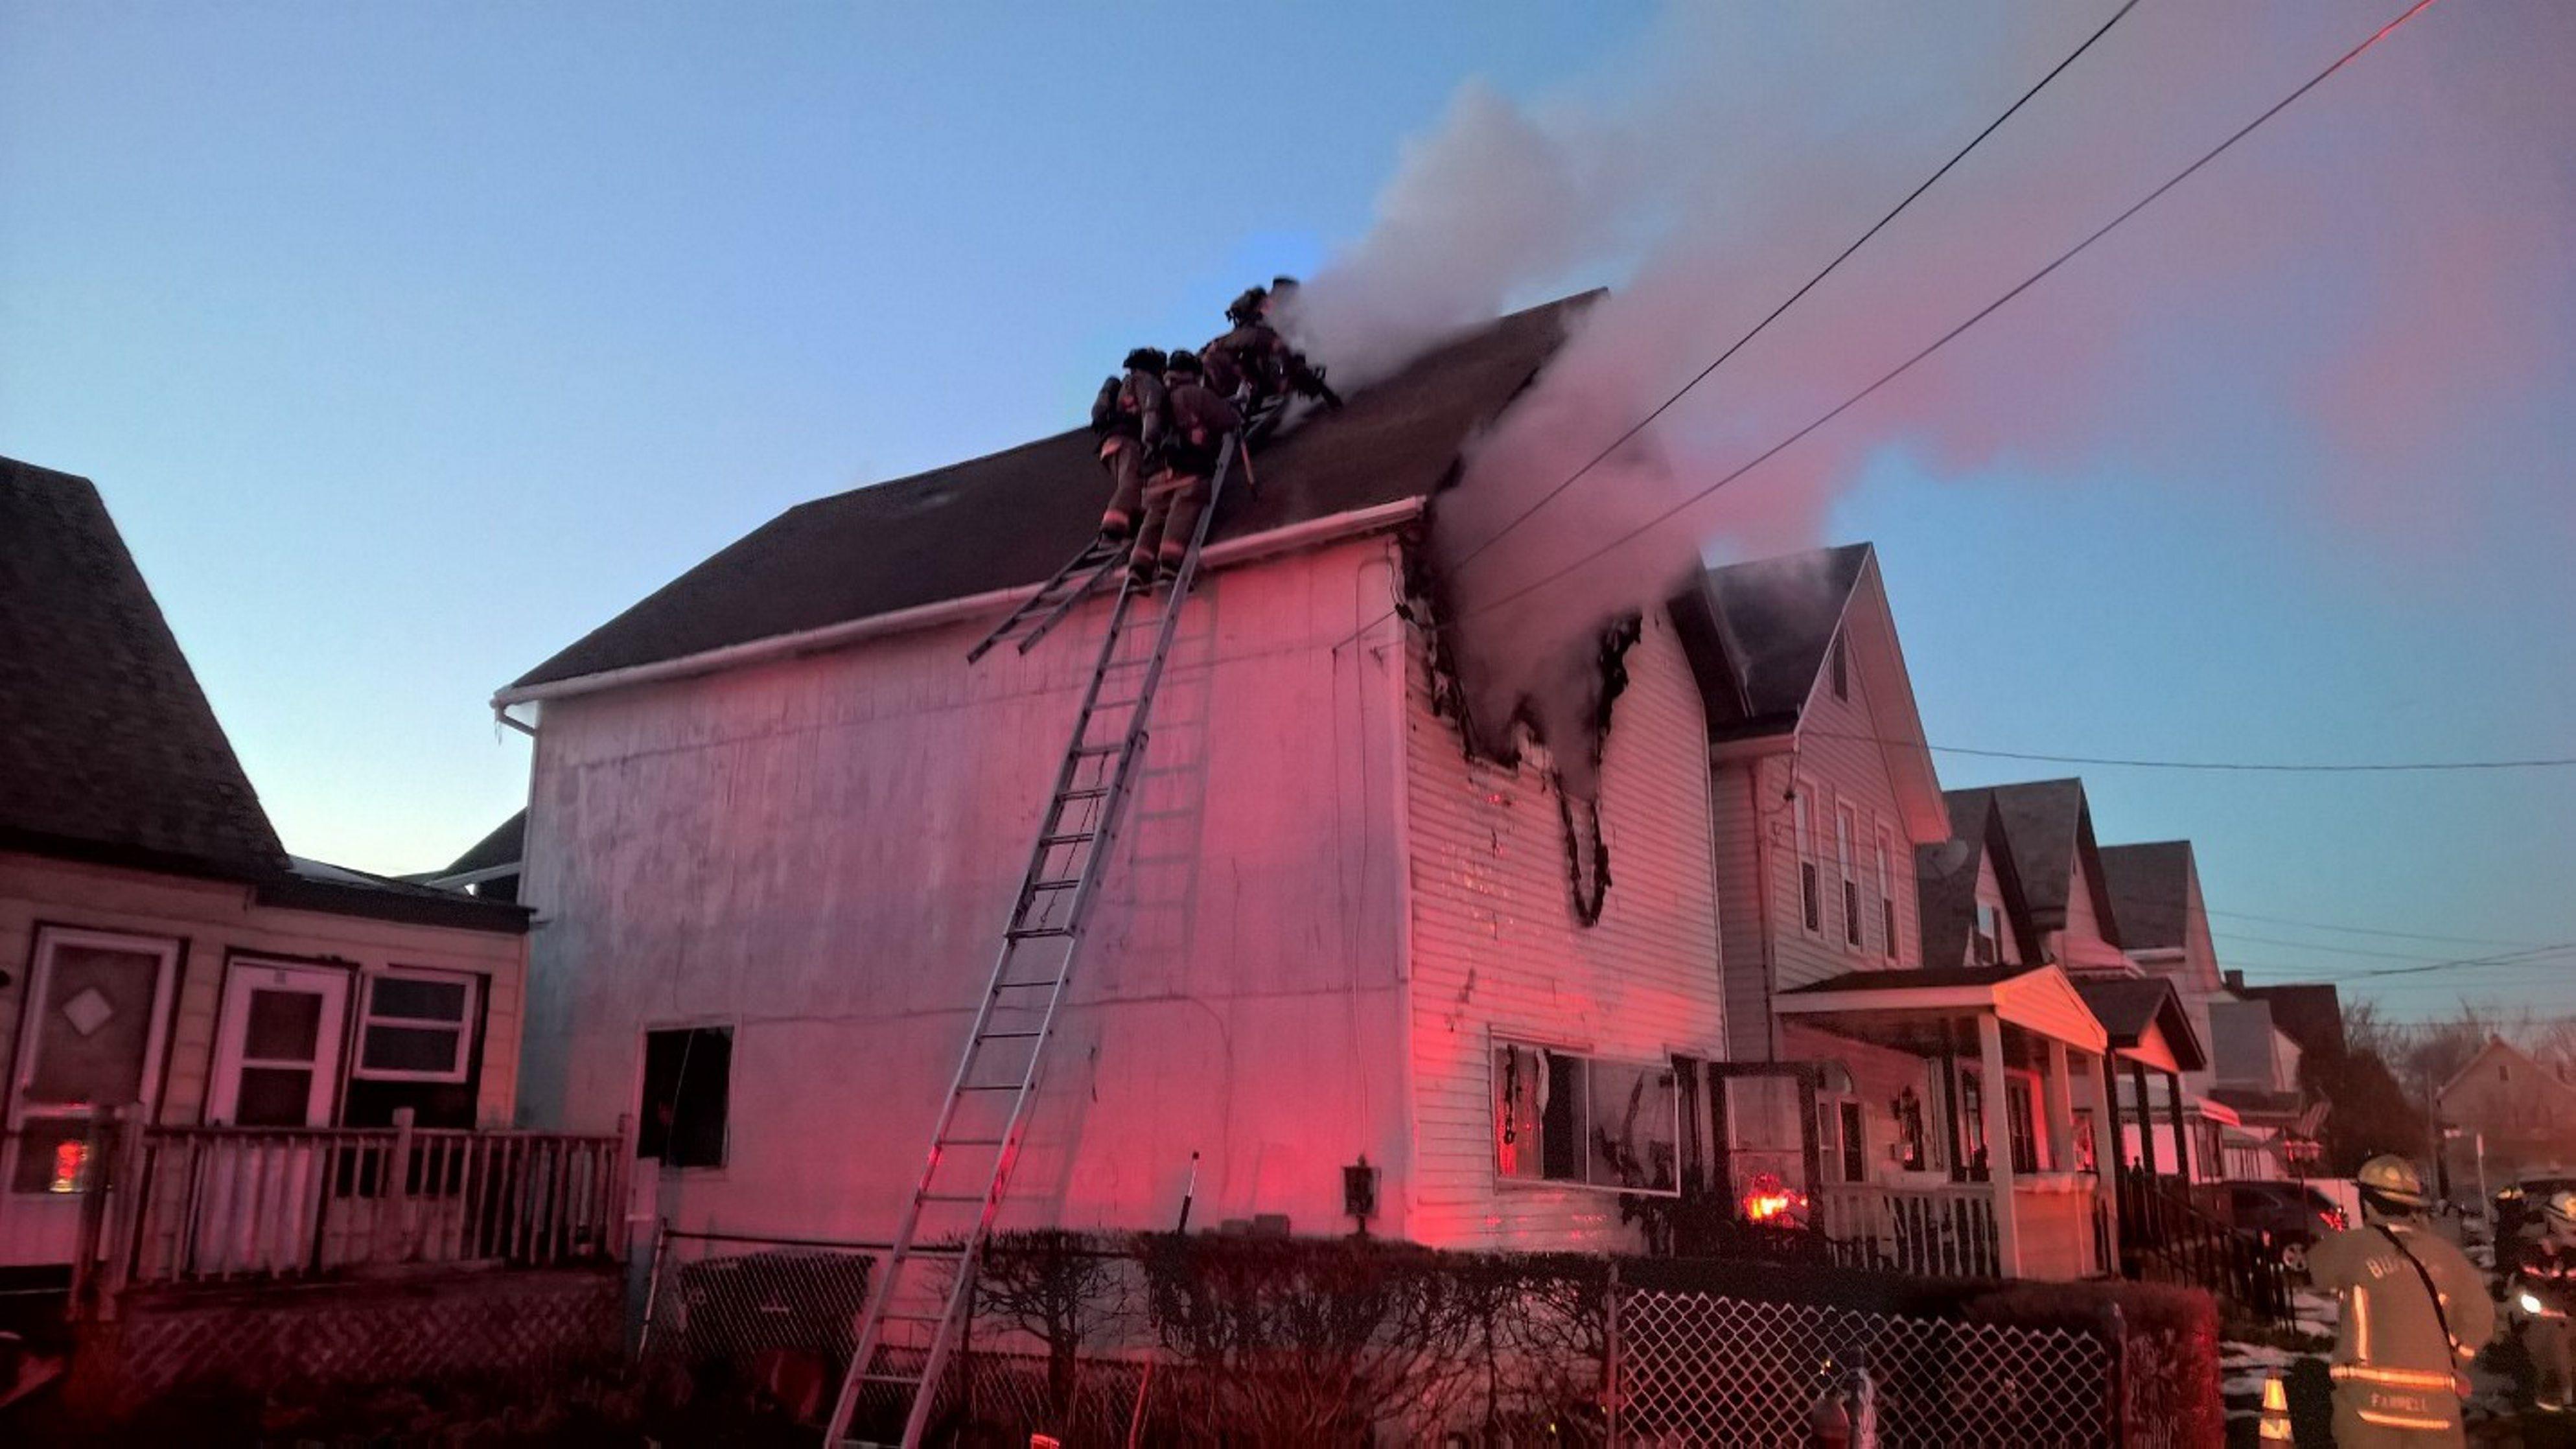 Buffalo firefighters battle a house fire on Vincennes Street Wednesday. (David Kazmierczak/Special to the News)